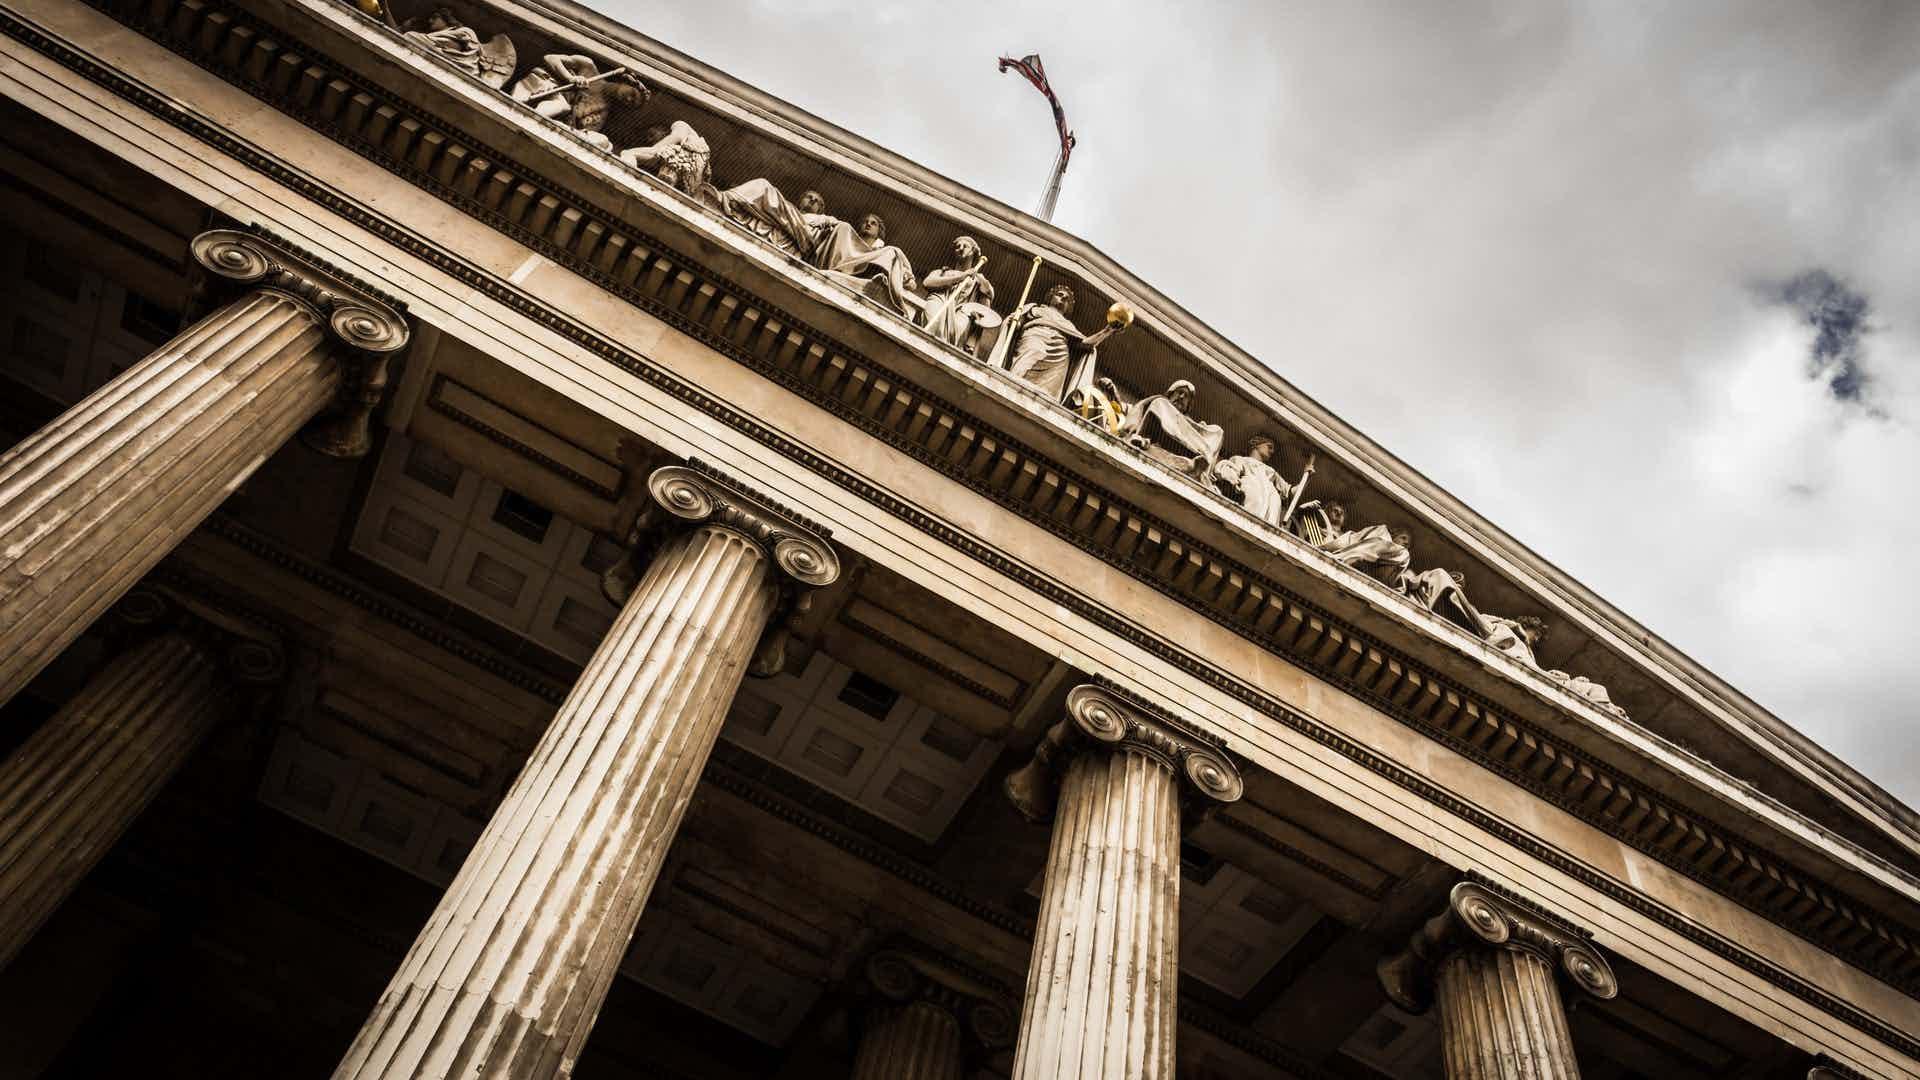 ondernemingsrecht advocaat nodig